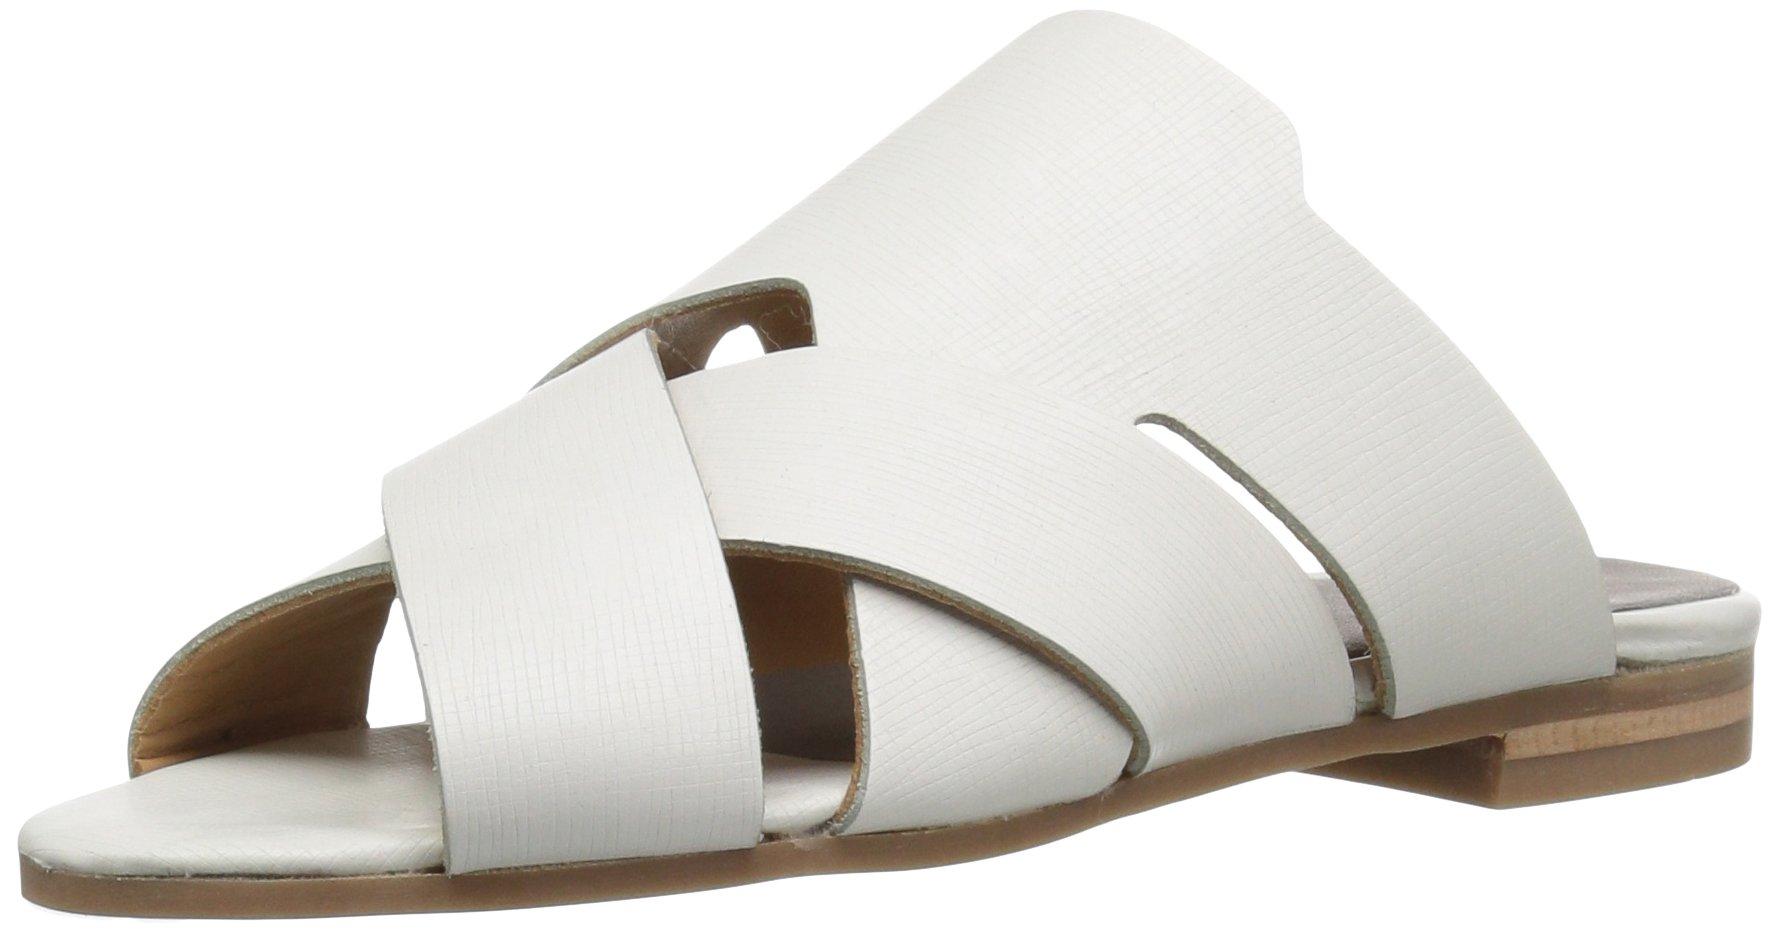 H by Hudson Women's Lonatu Calf Flat Sandal, White, 38 EU/7 M US